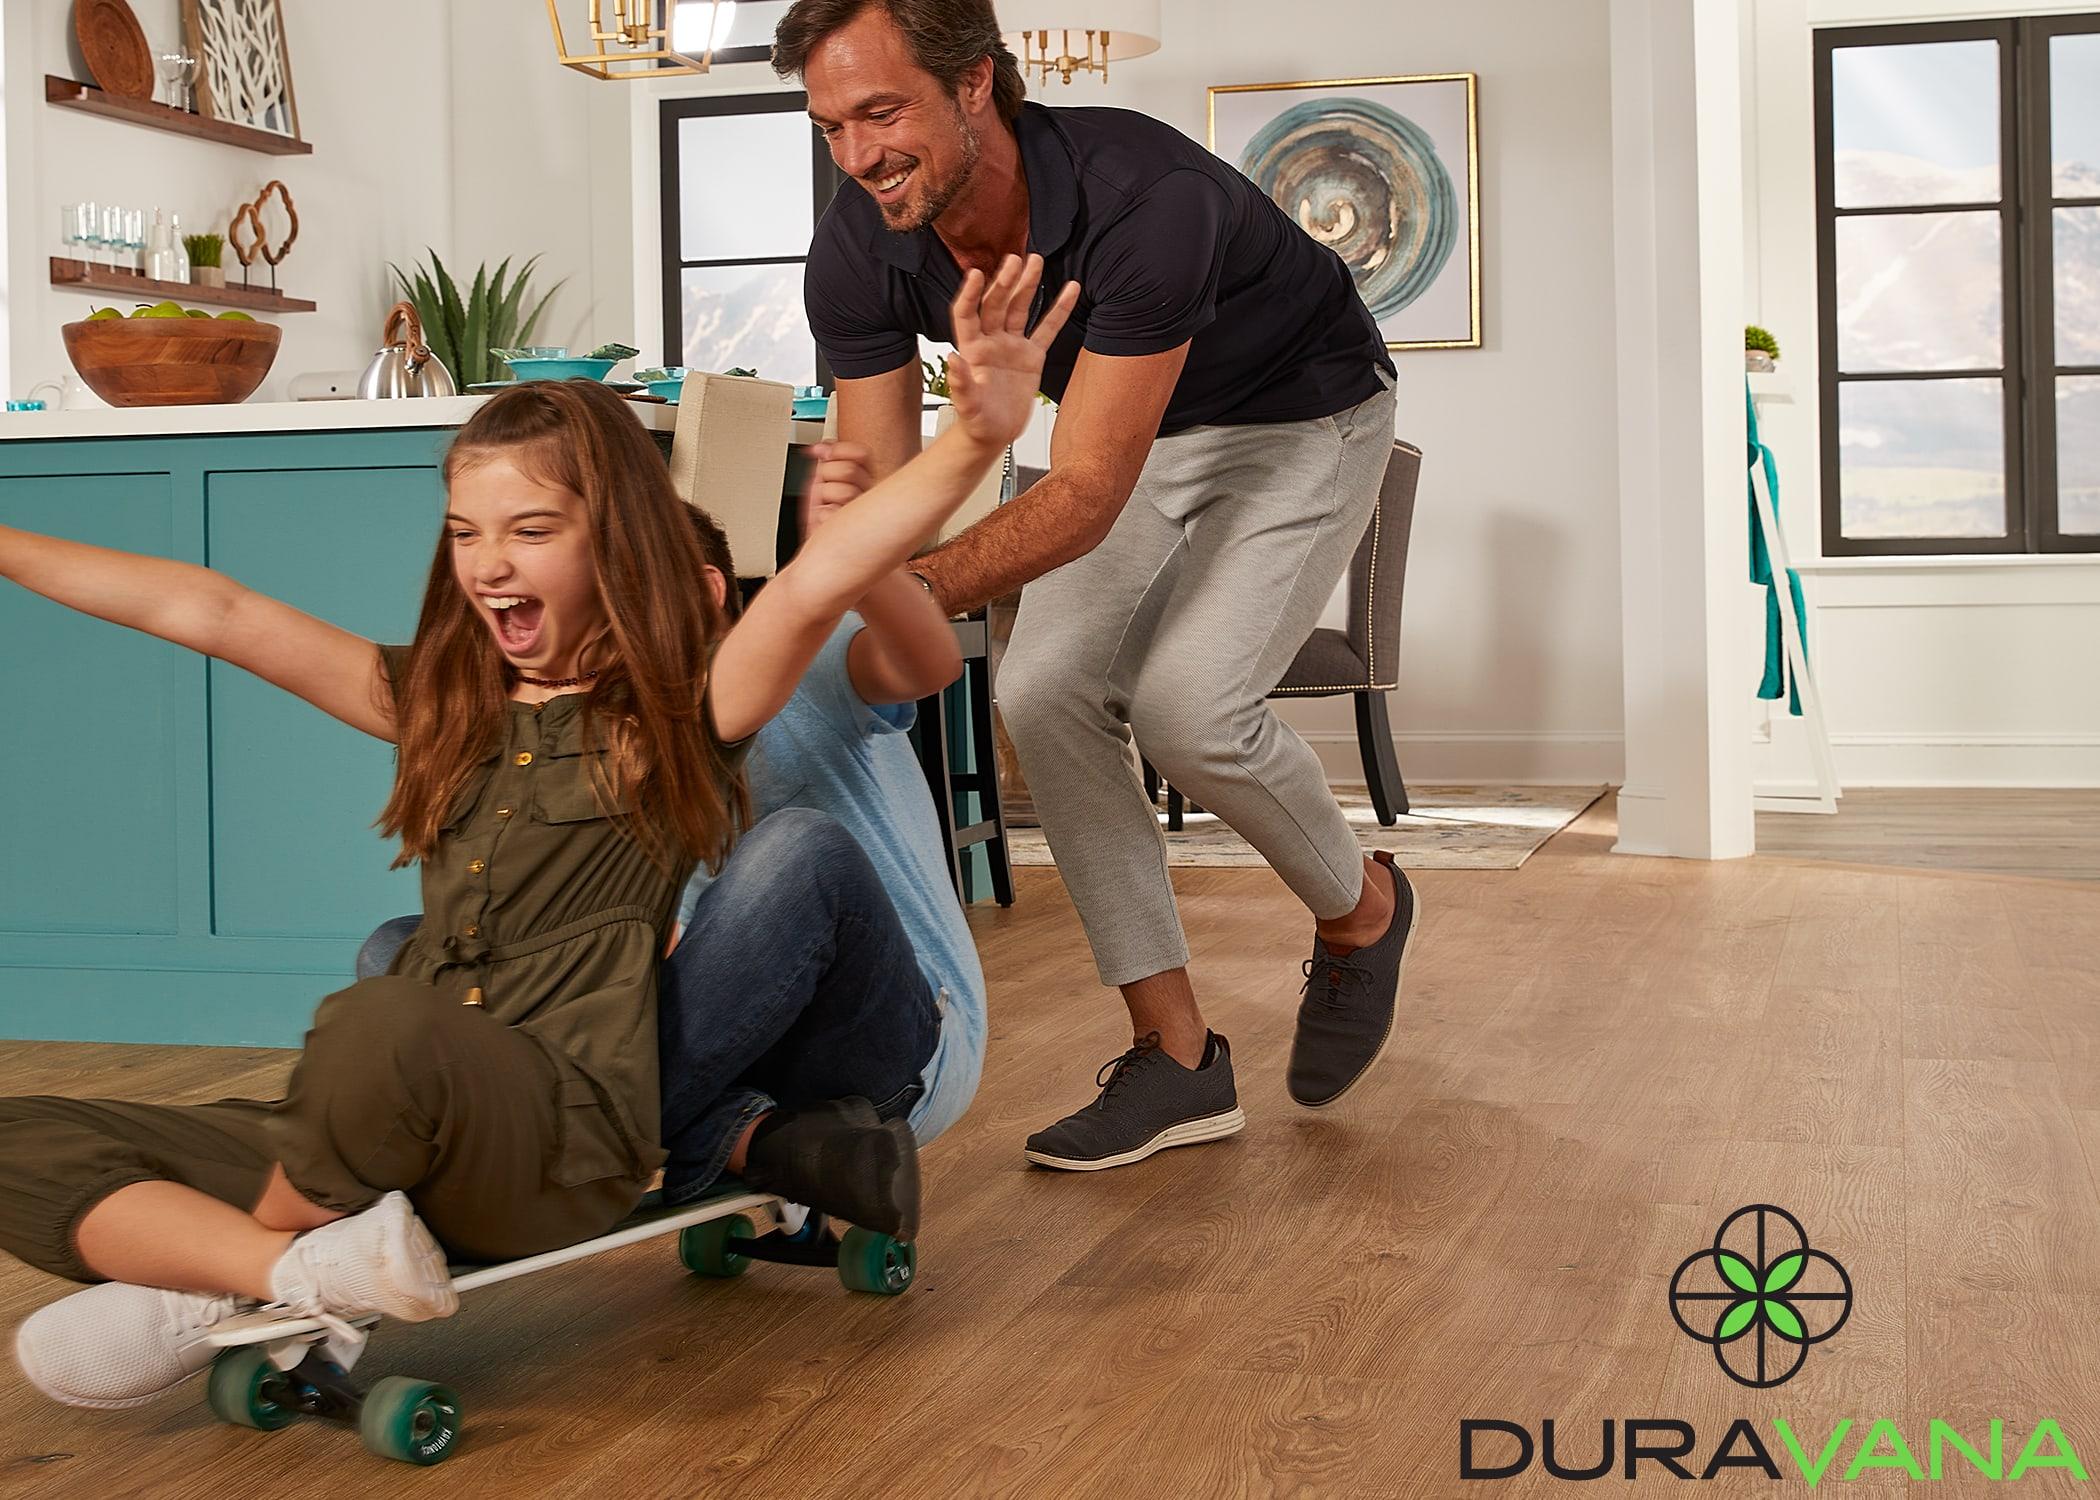 man pushing kids on skateboard in kitchen on Duravana hybrid resilient floors